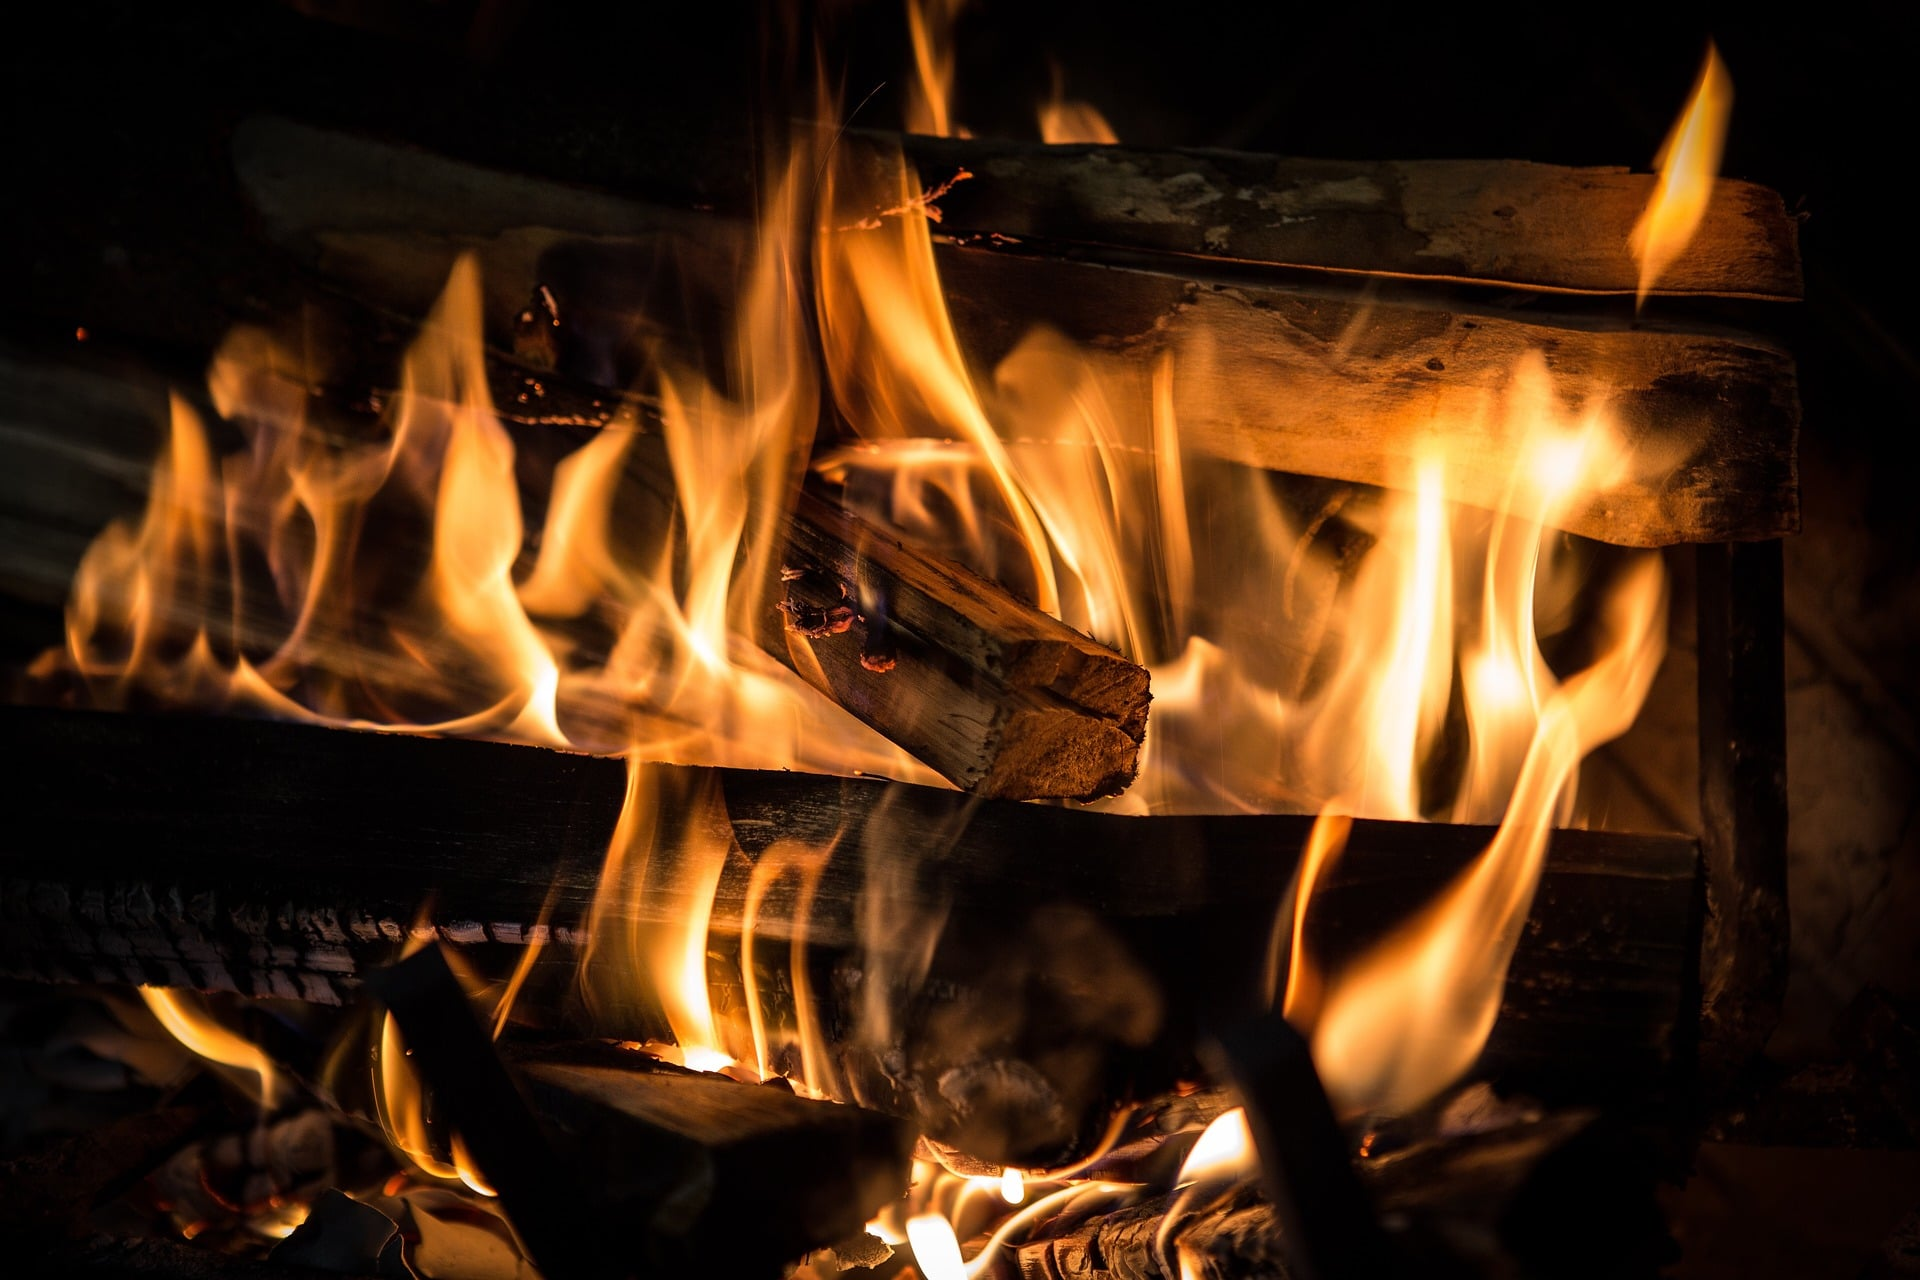 Saudaraku, Jagalah Keluarga Kita dari Api Neraka